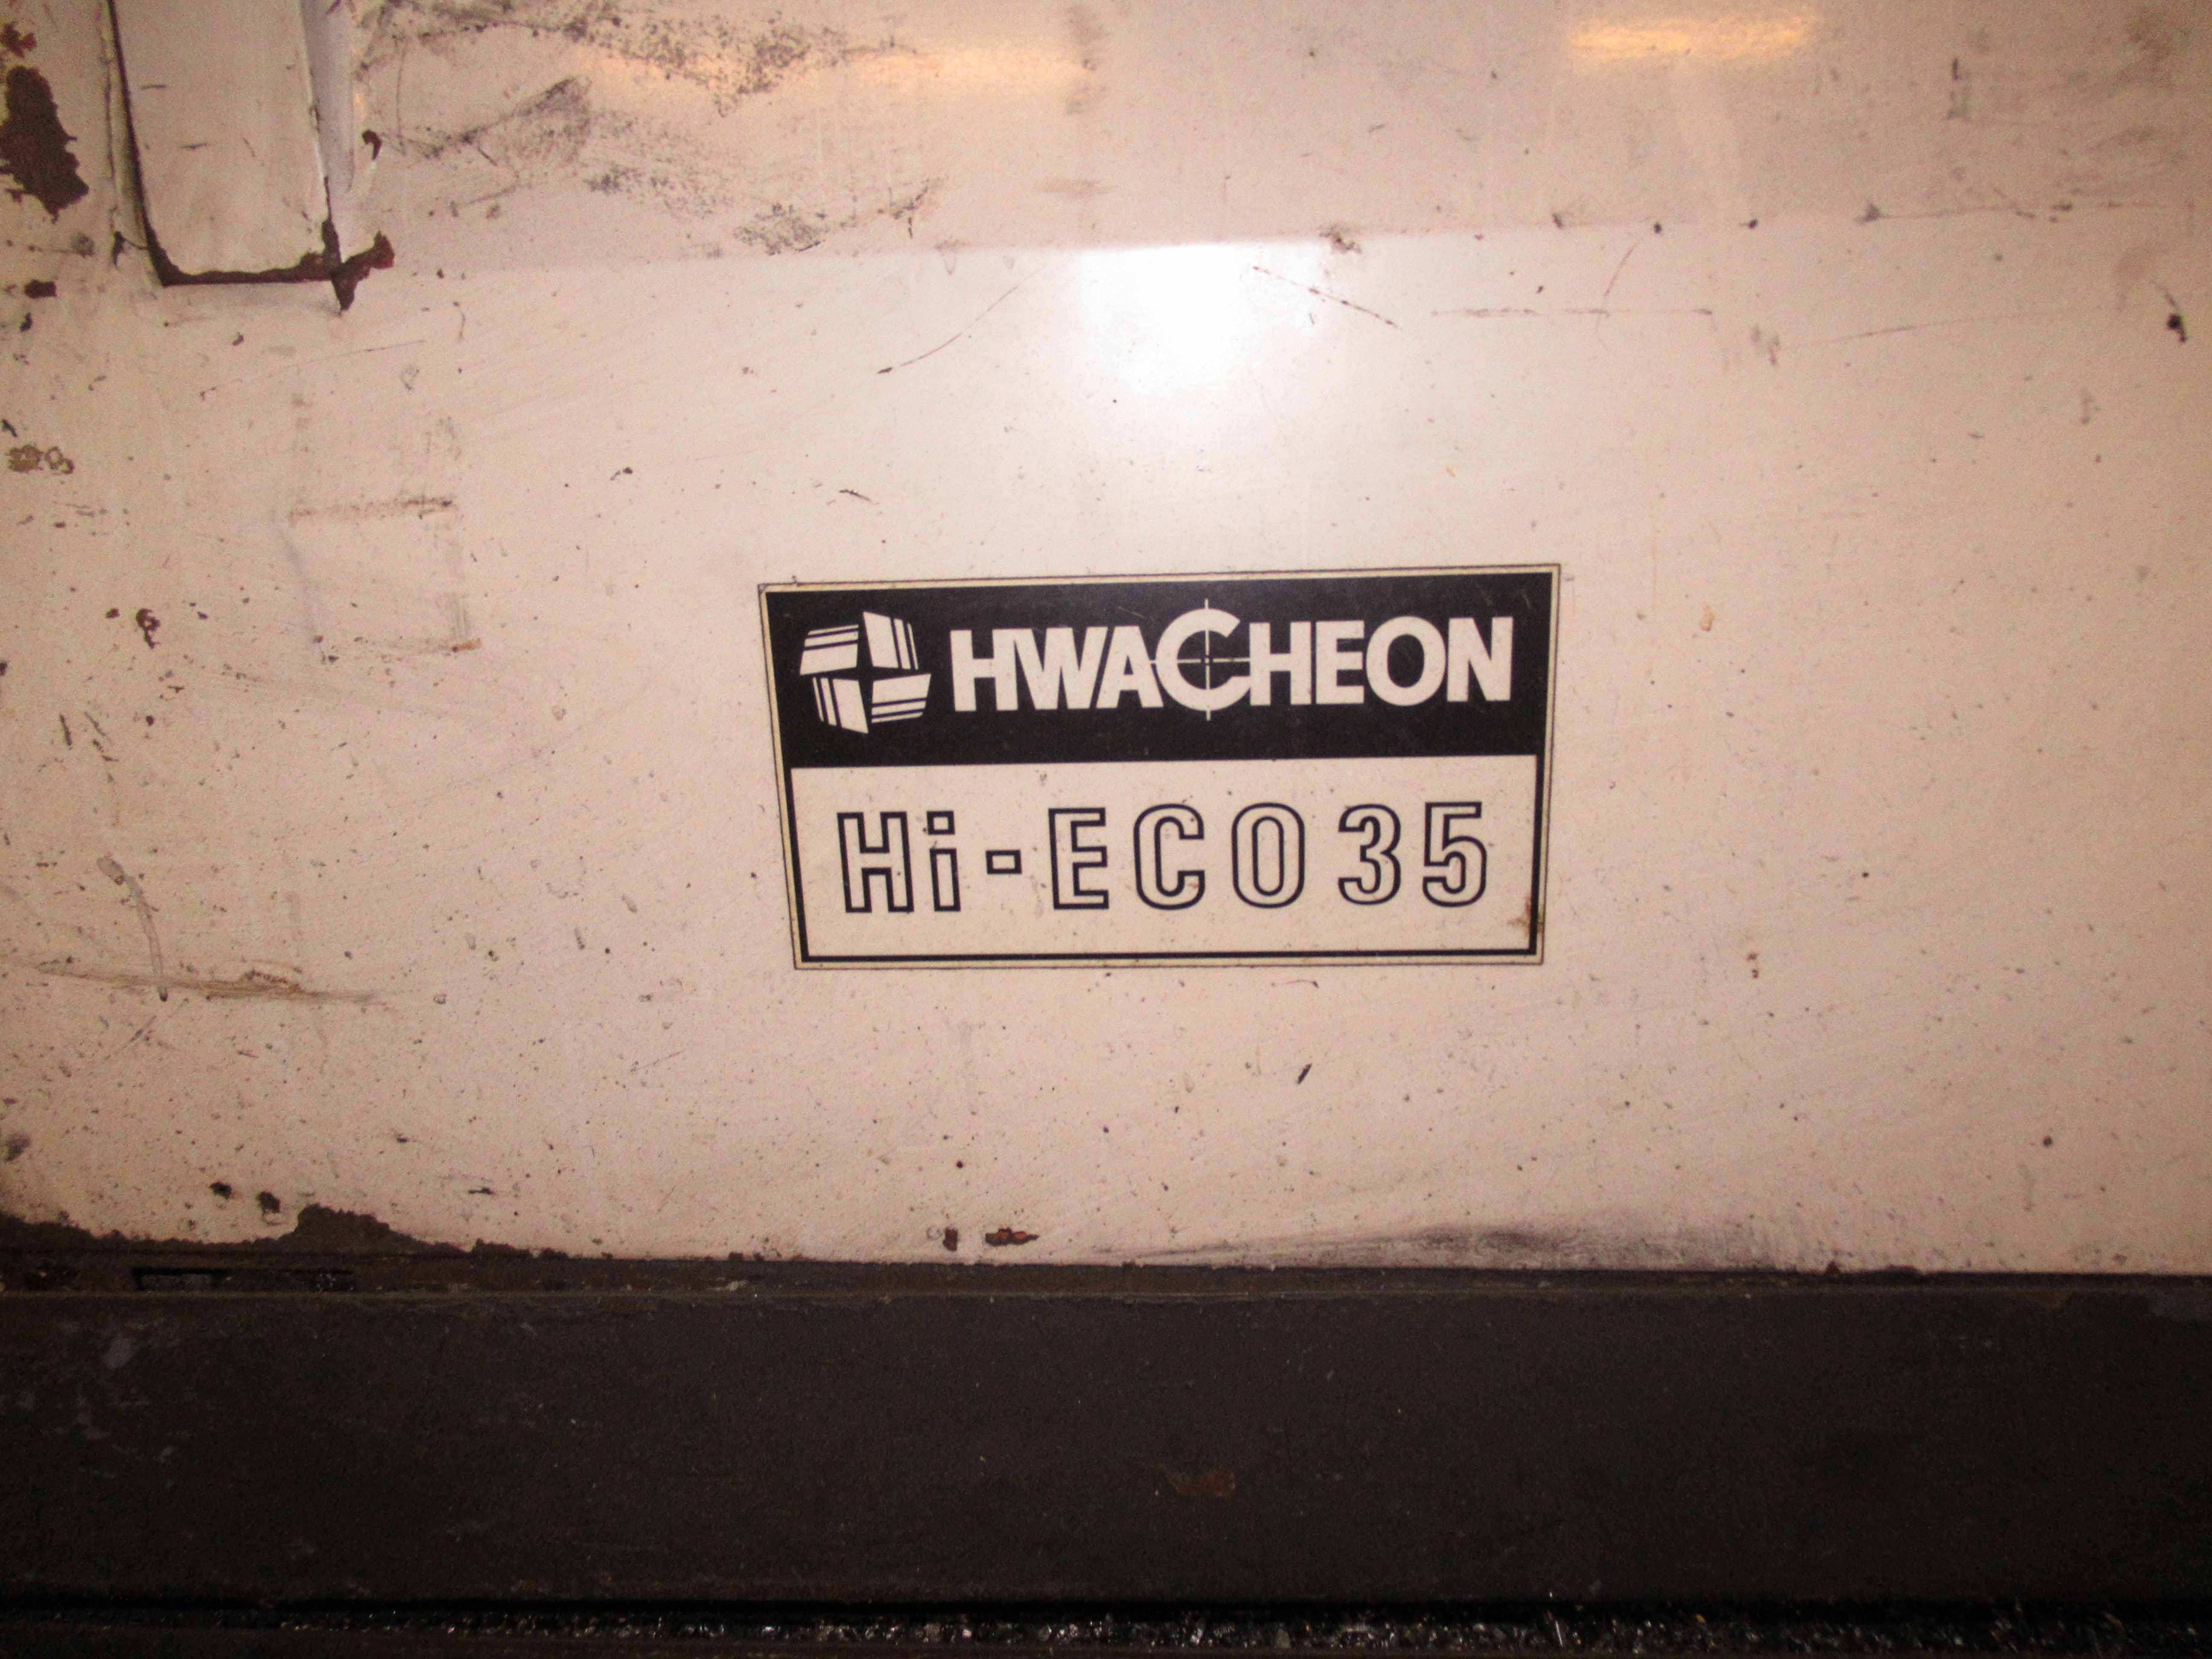 "Lot 22 - HWACHEON MDL. HI-ECO35 CNC LATHE, Fanuc 18T CNC control, 4.13"" spdl. bore, 23.62"" sw. over bed, 16."